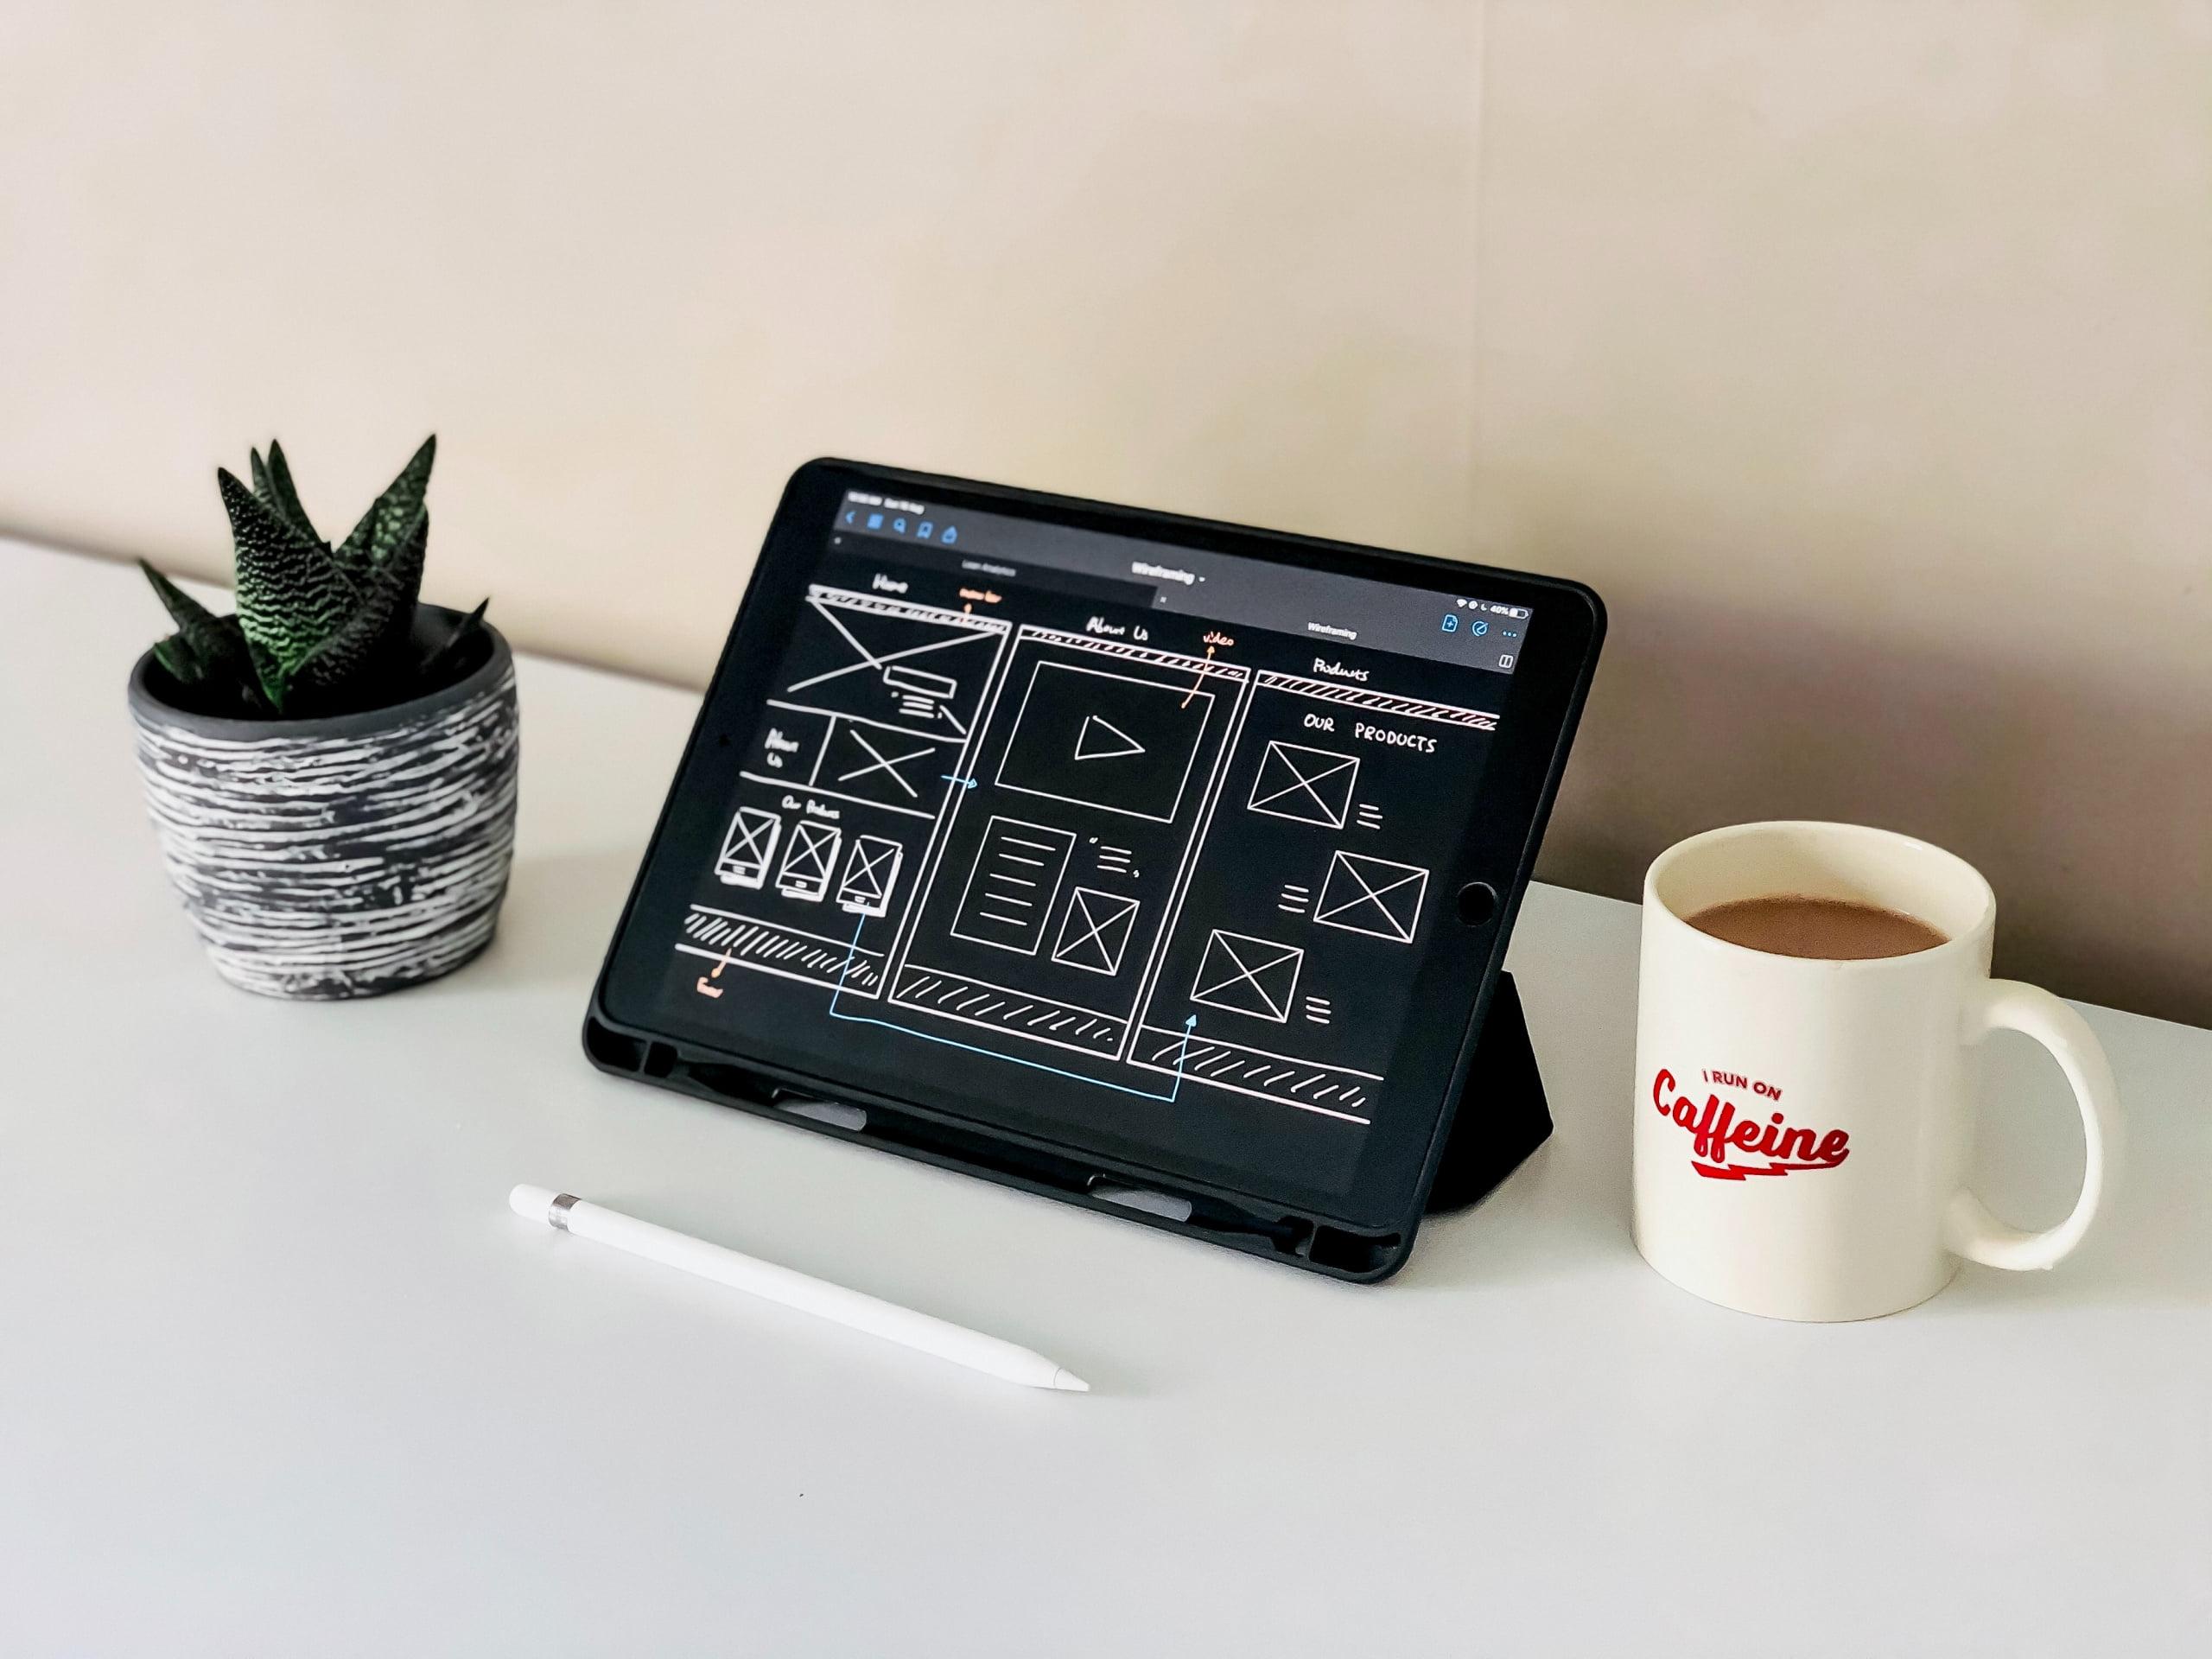 working on website design